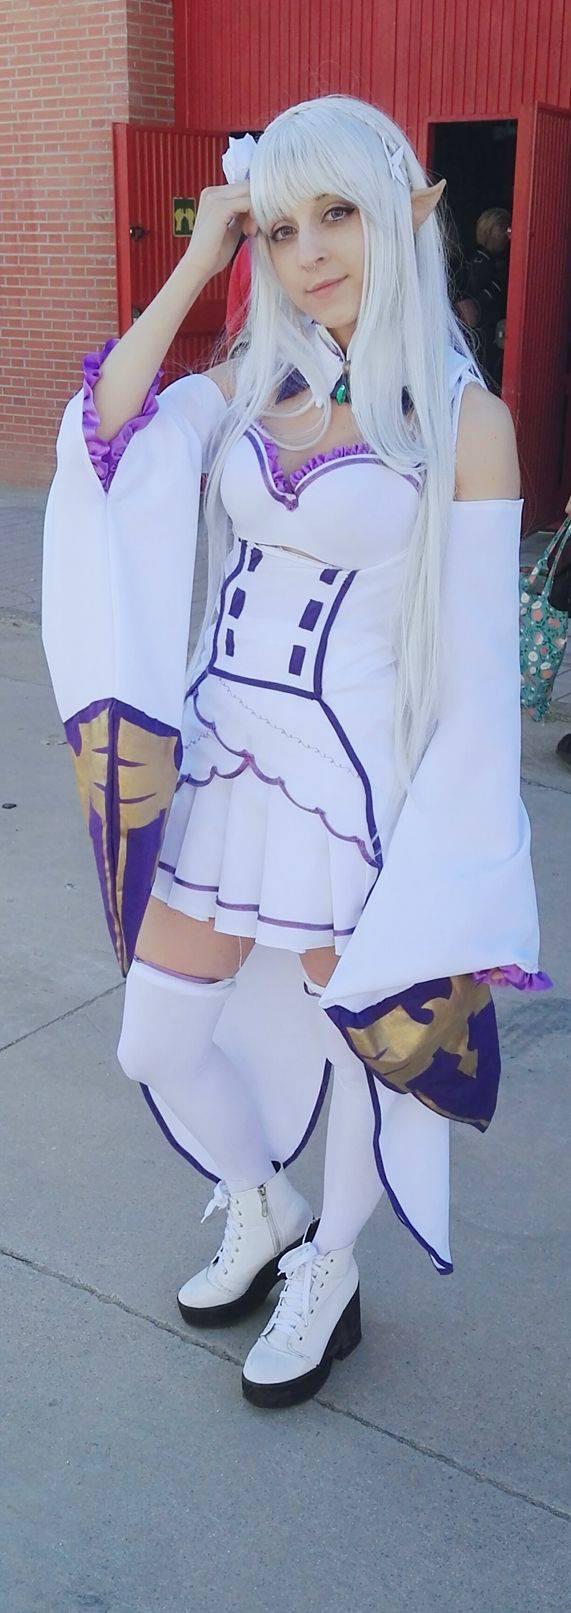 Emilia ( Re:Zero ) by itsukih